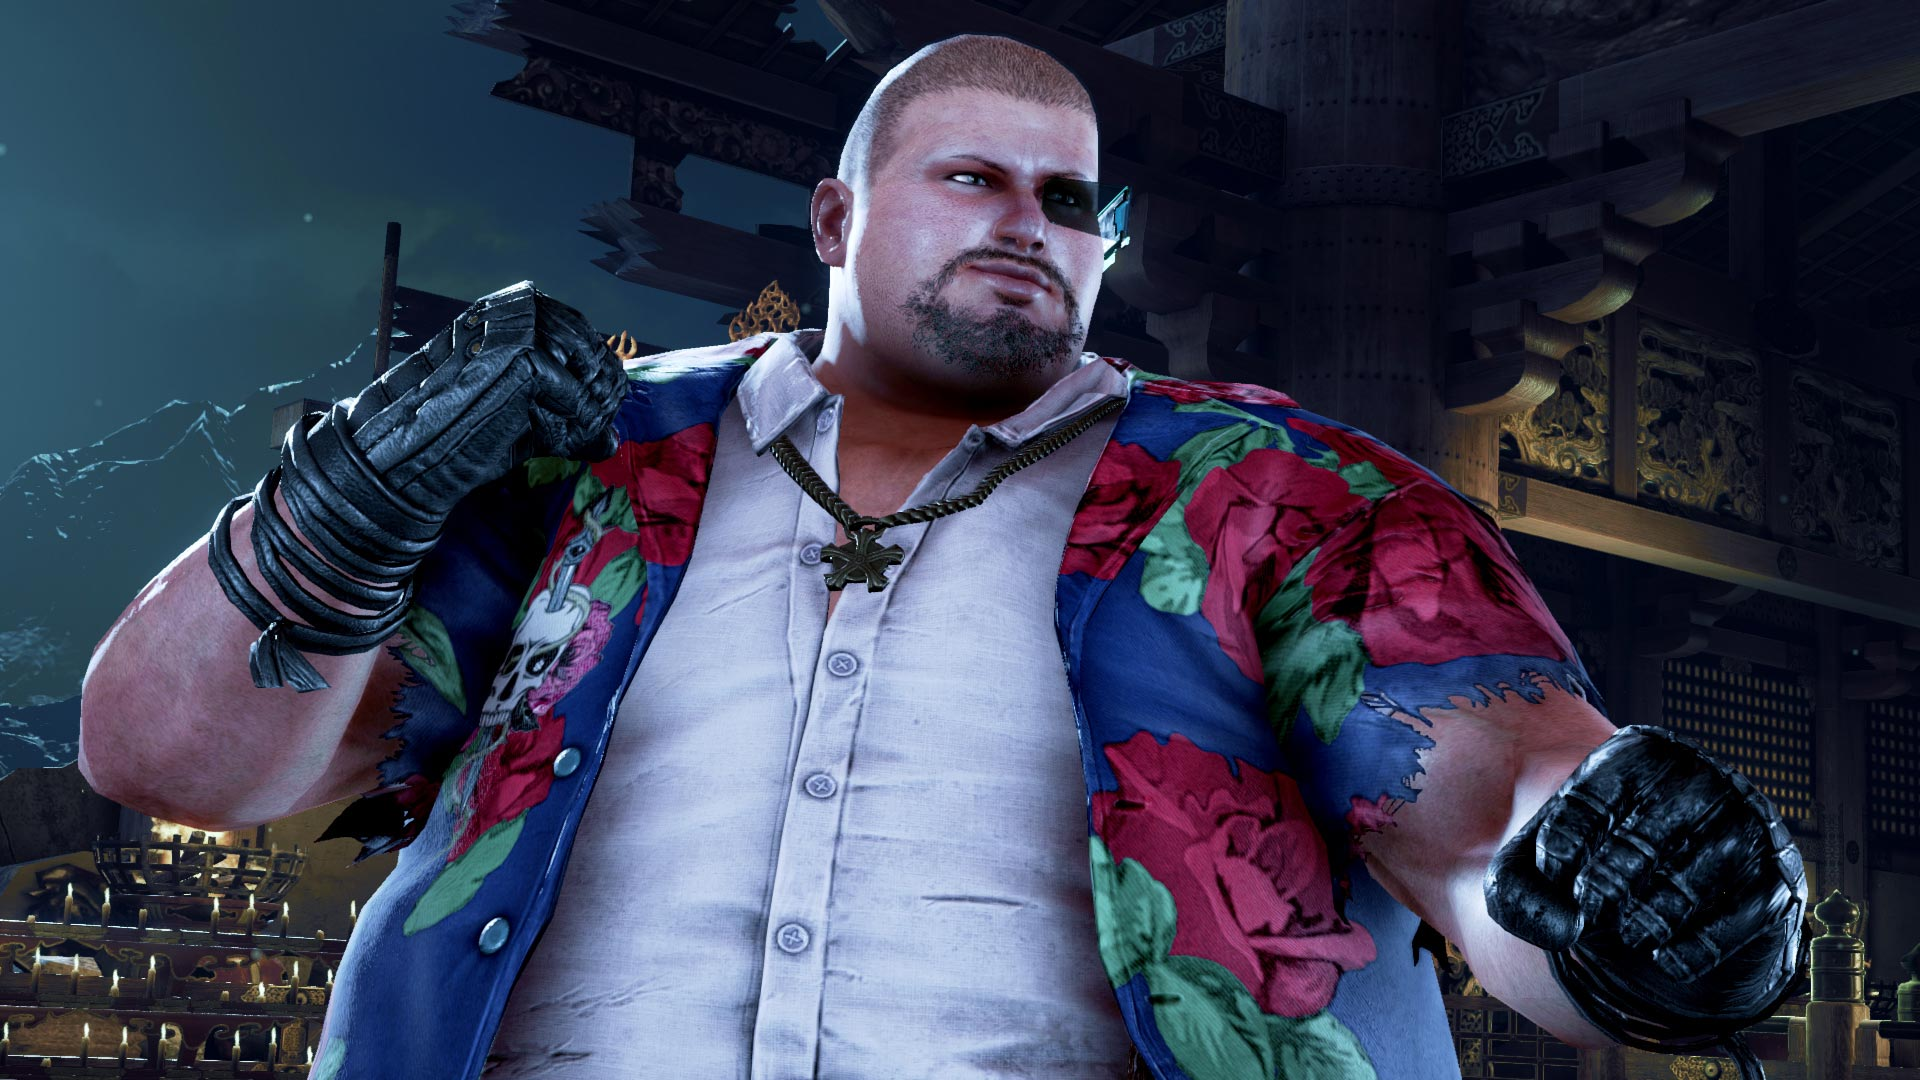 Tekken Season 3 accessories 3 out of 4 image gallery